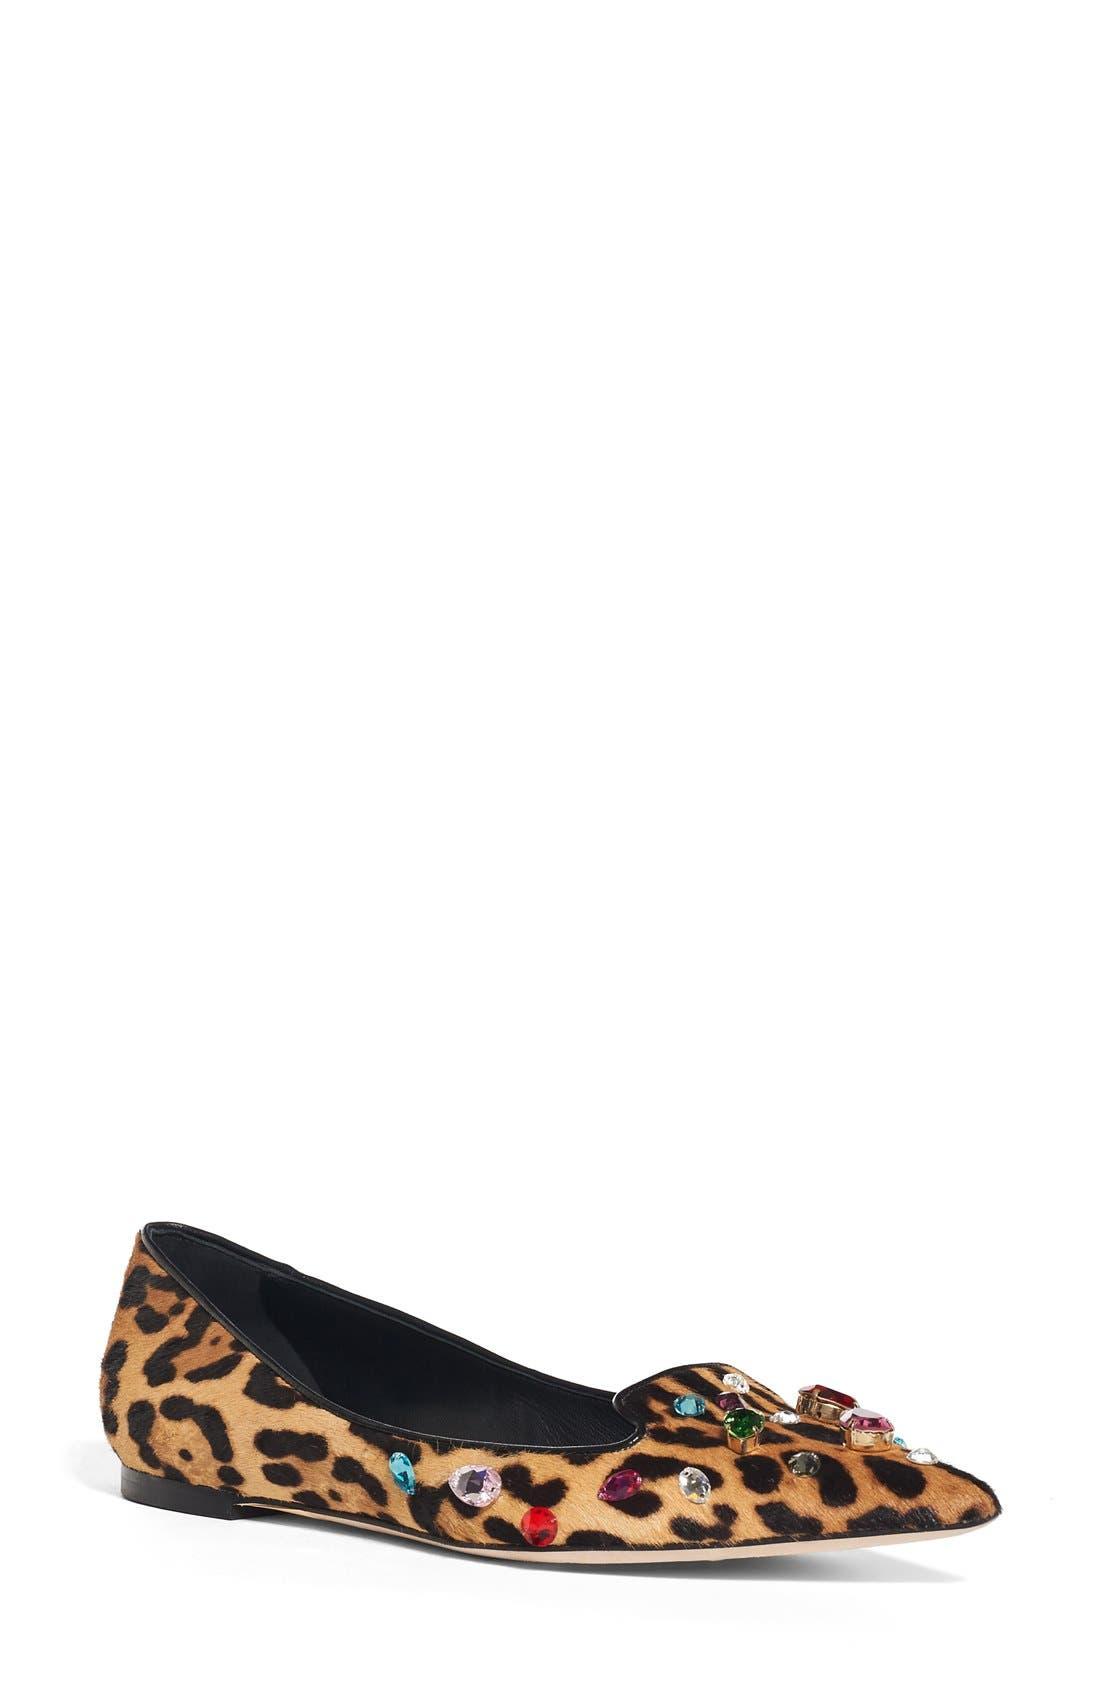 Alternate Image 1 Selected - Dolce&Gabbana Leo Embellished Leopard Print Flat (Women)